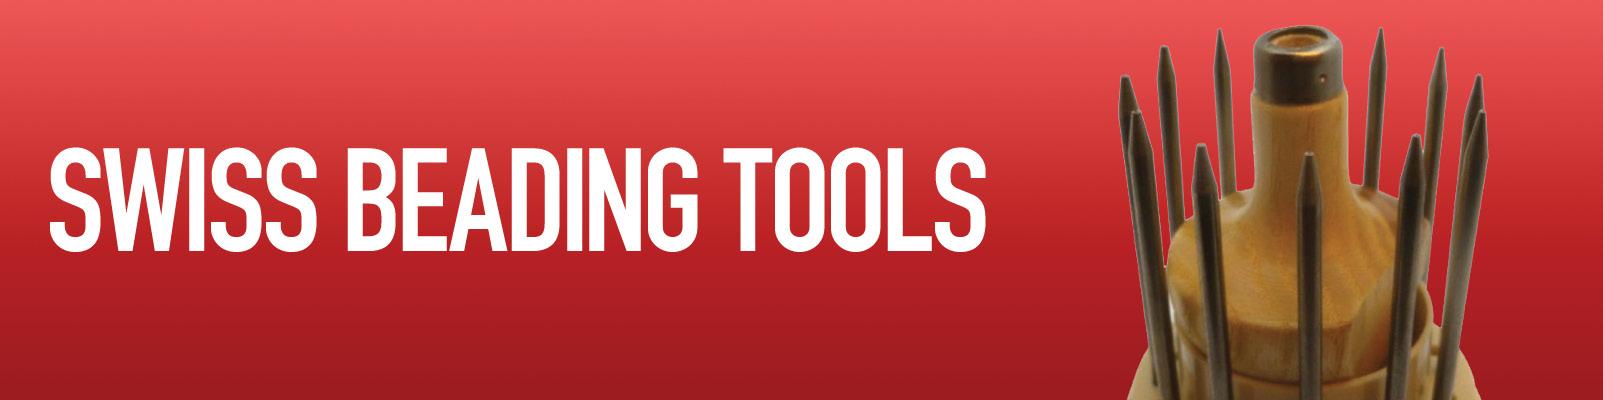 Swiss Beading Tools